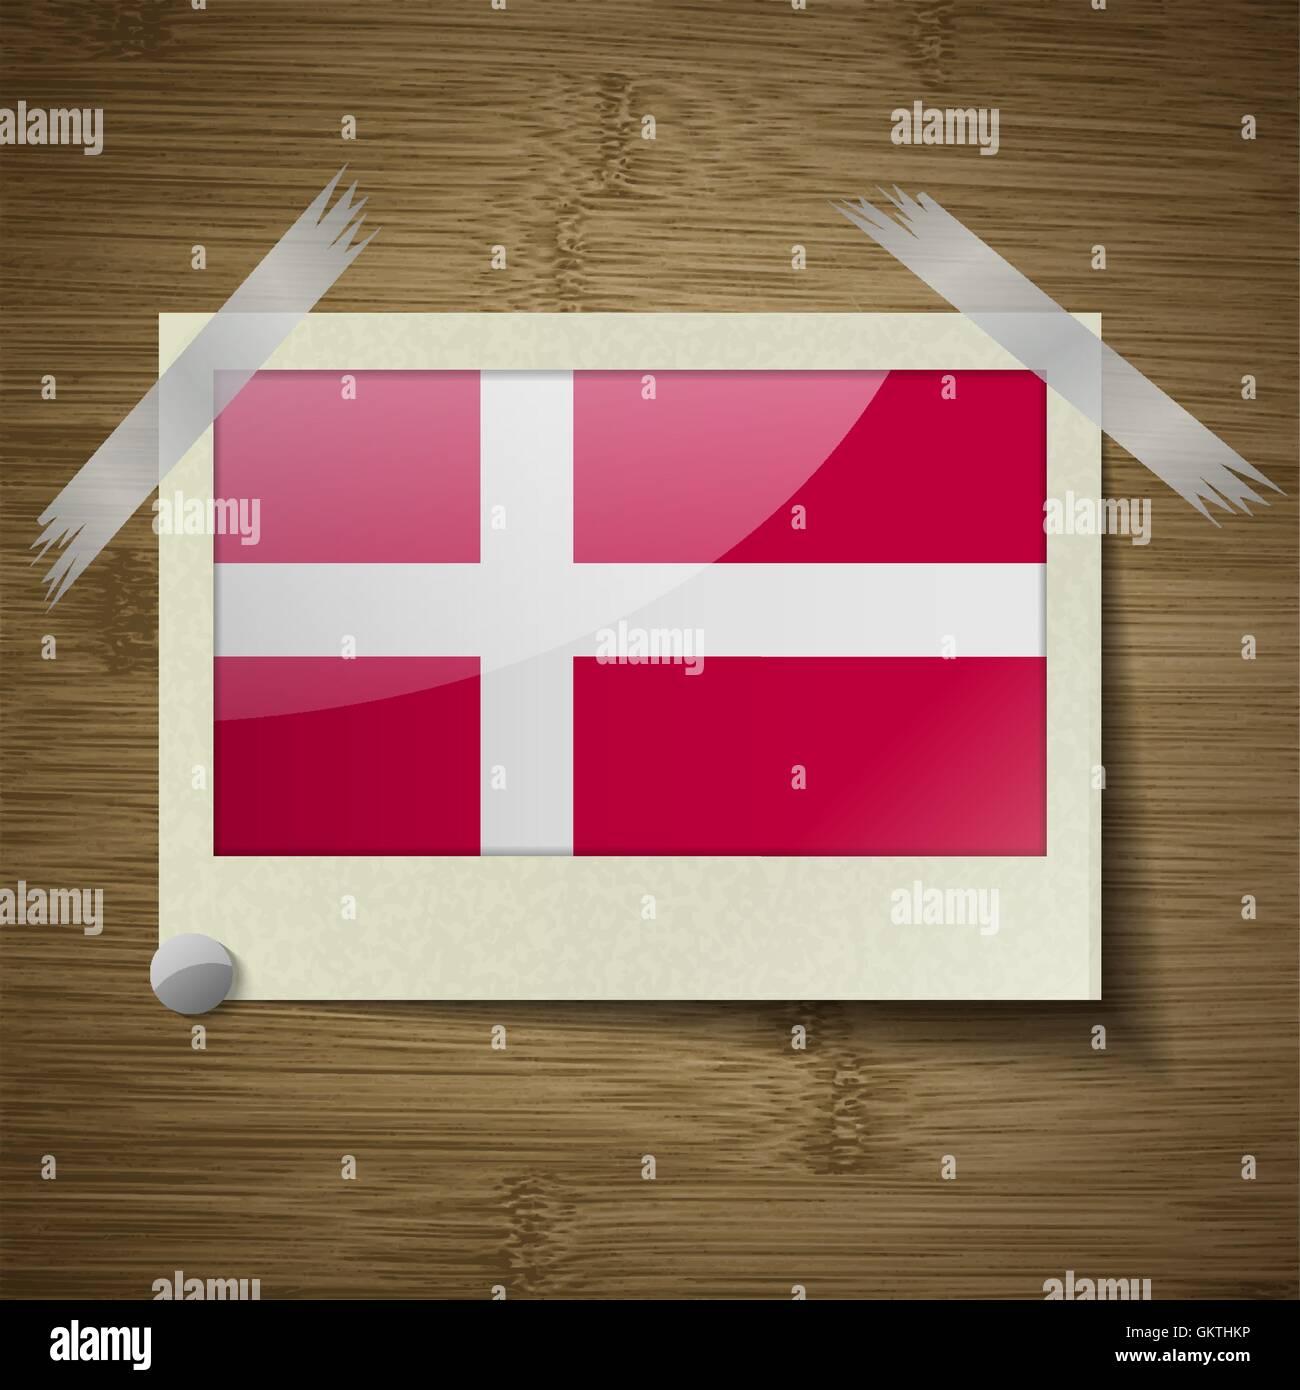 Flags Denmark at frame on wooden texture. Vector Stock Vector